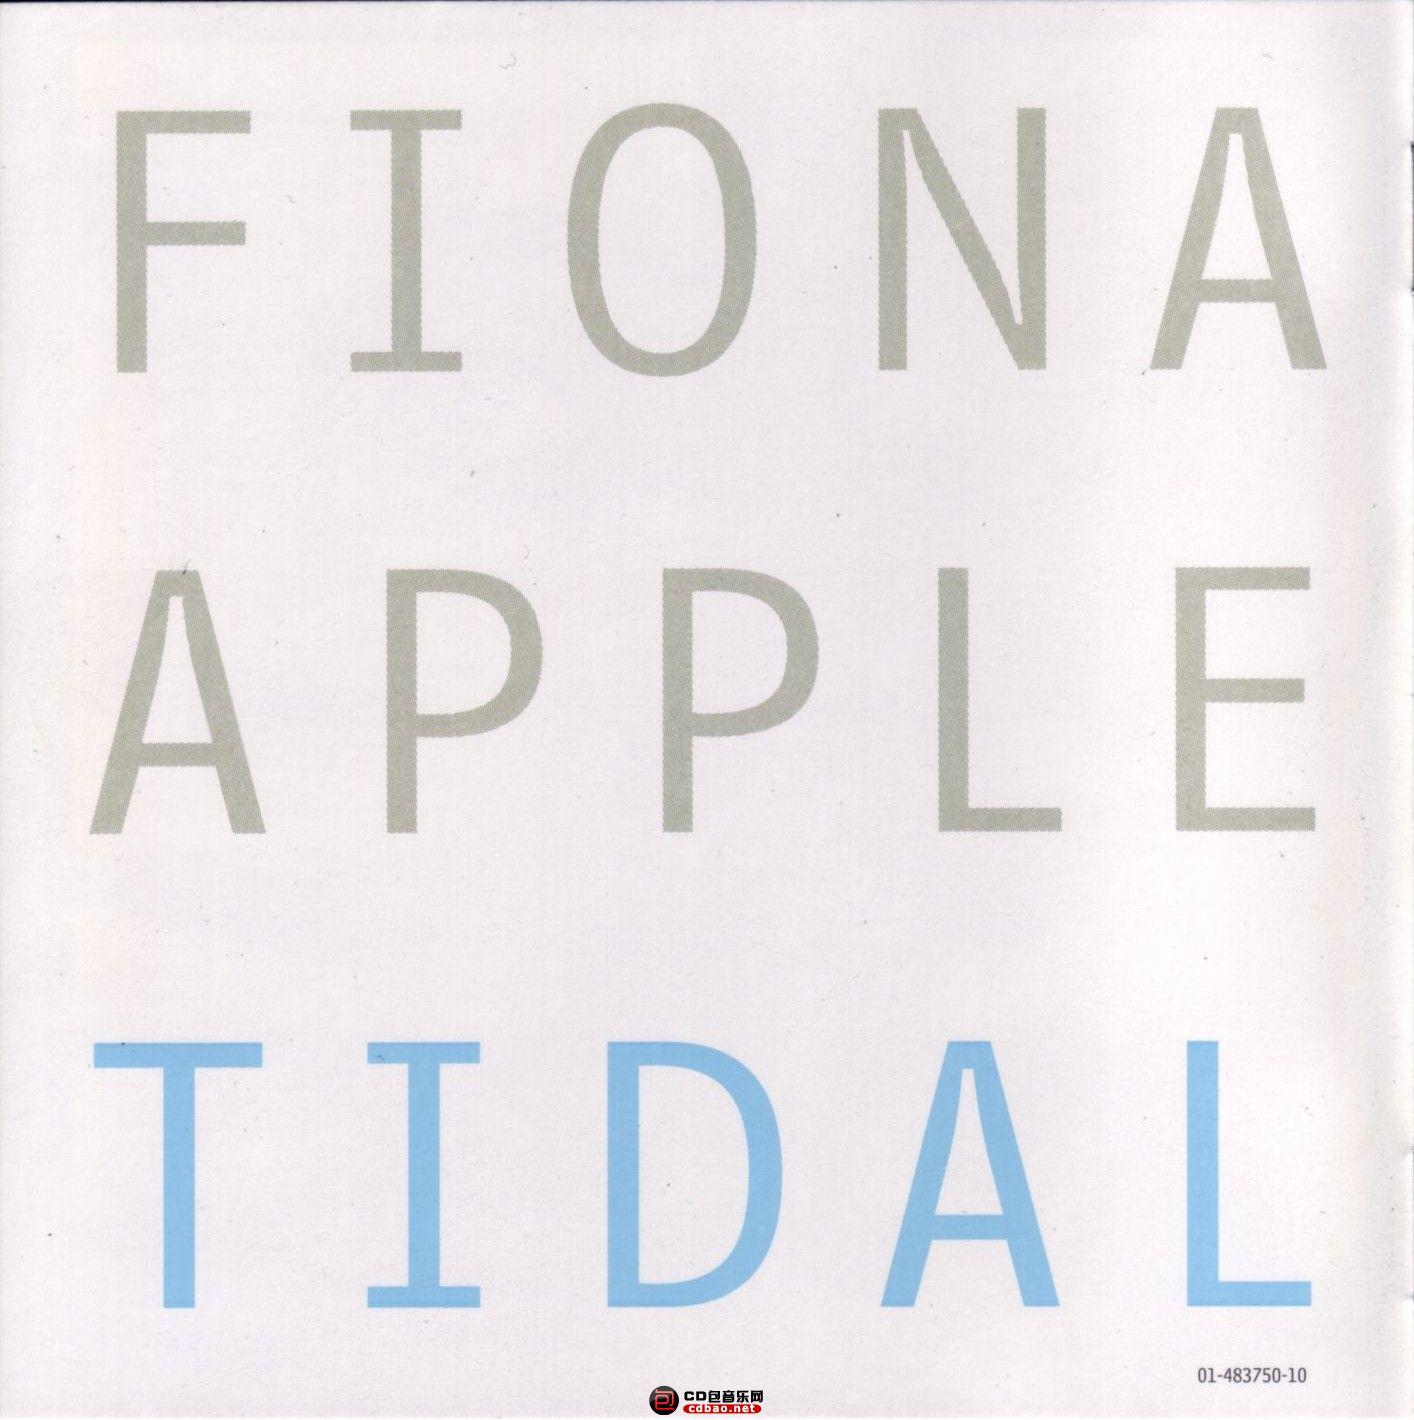 Tidal_booklet_12.jpg